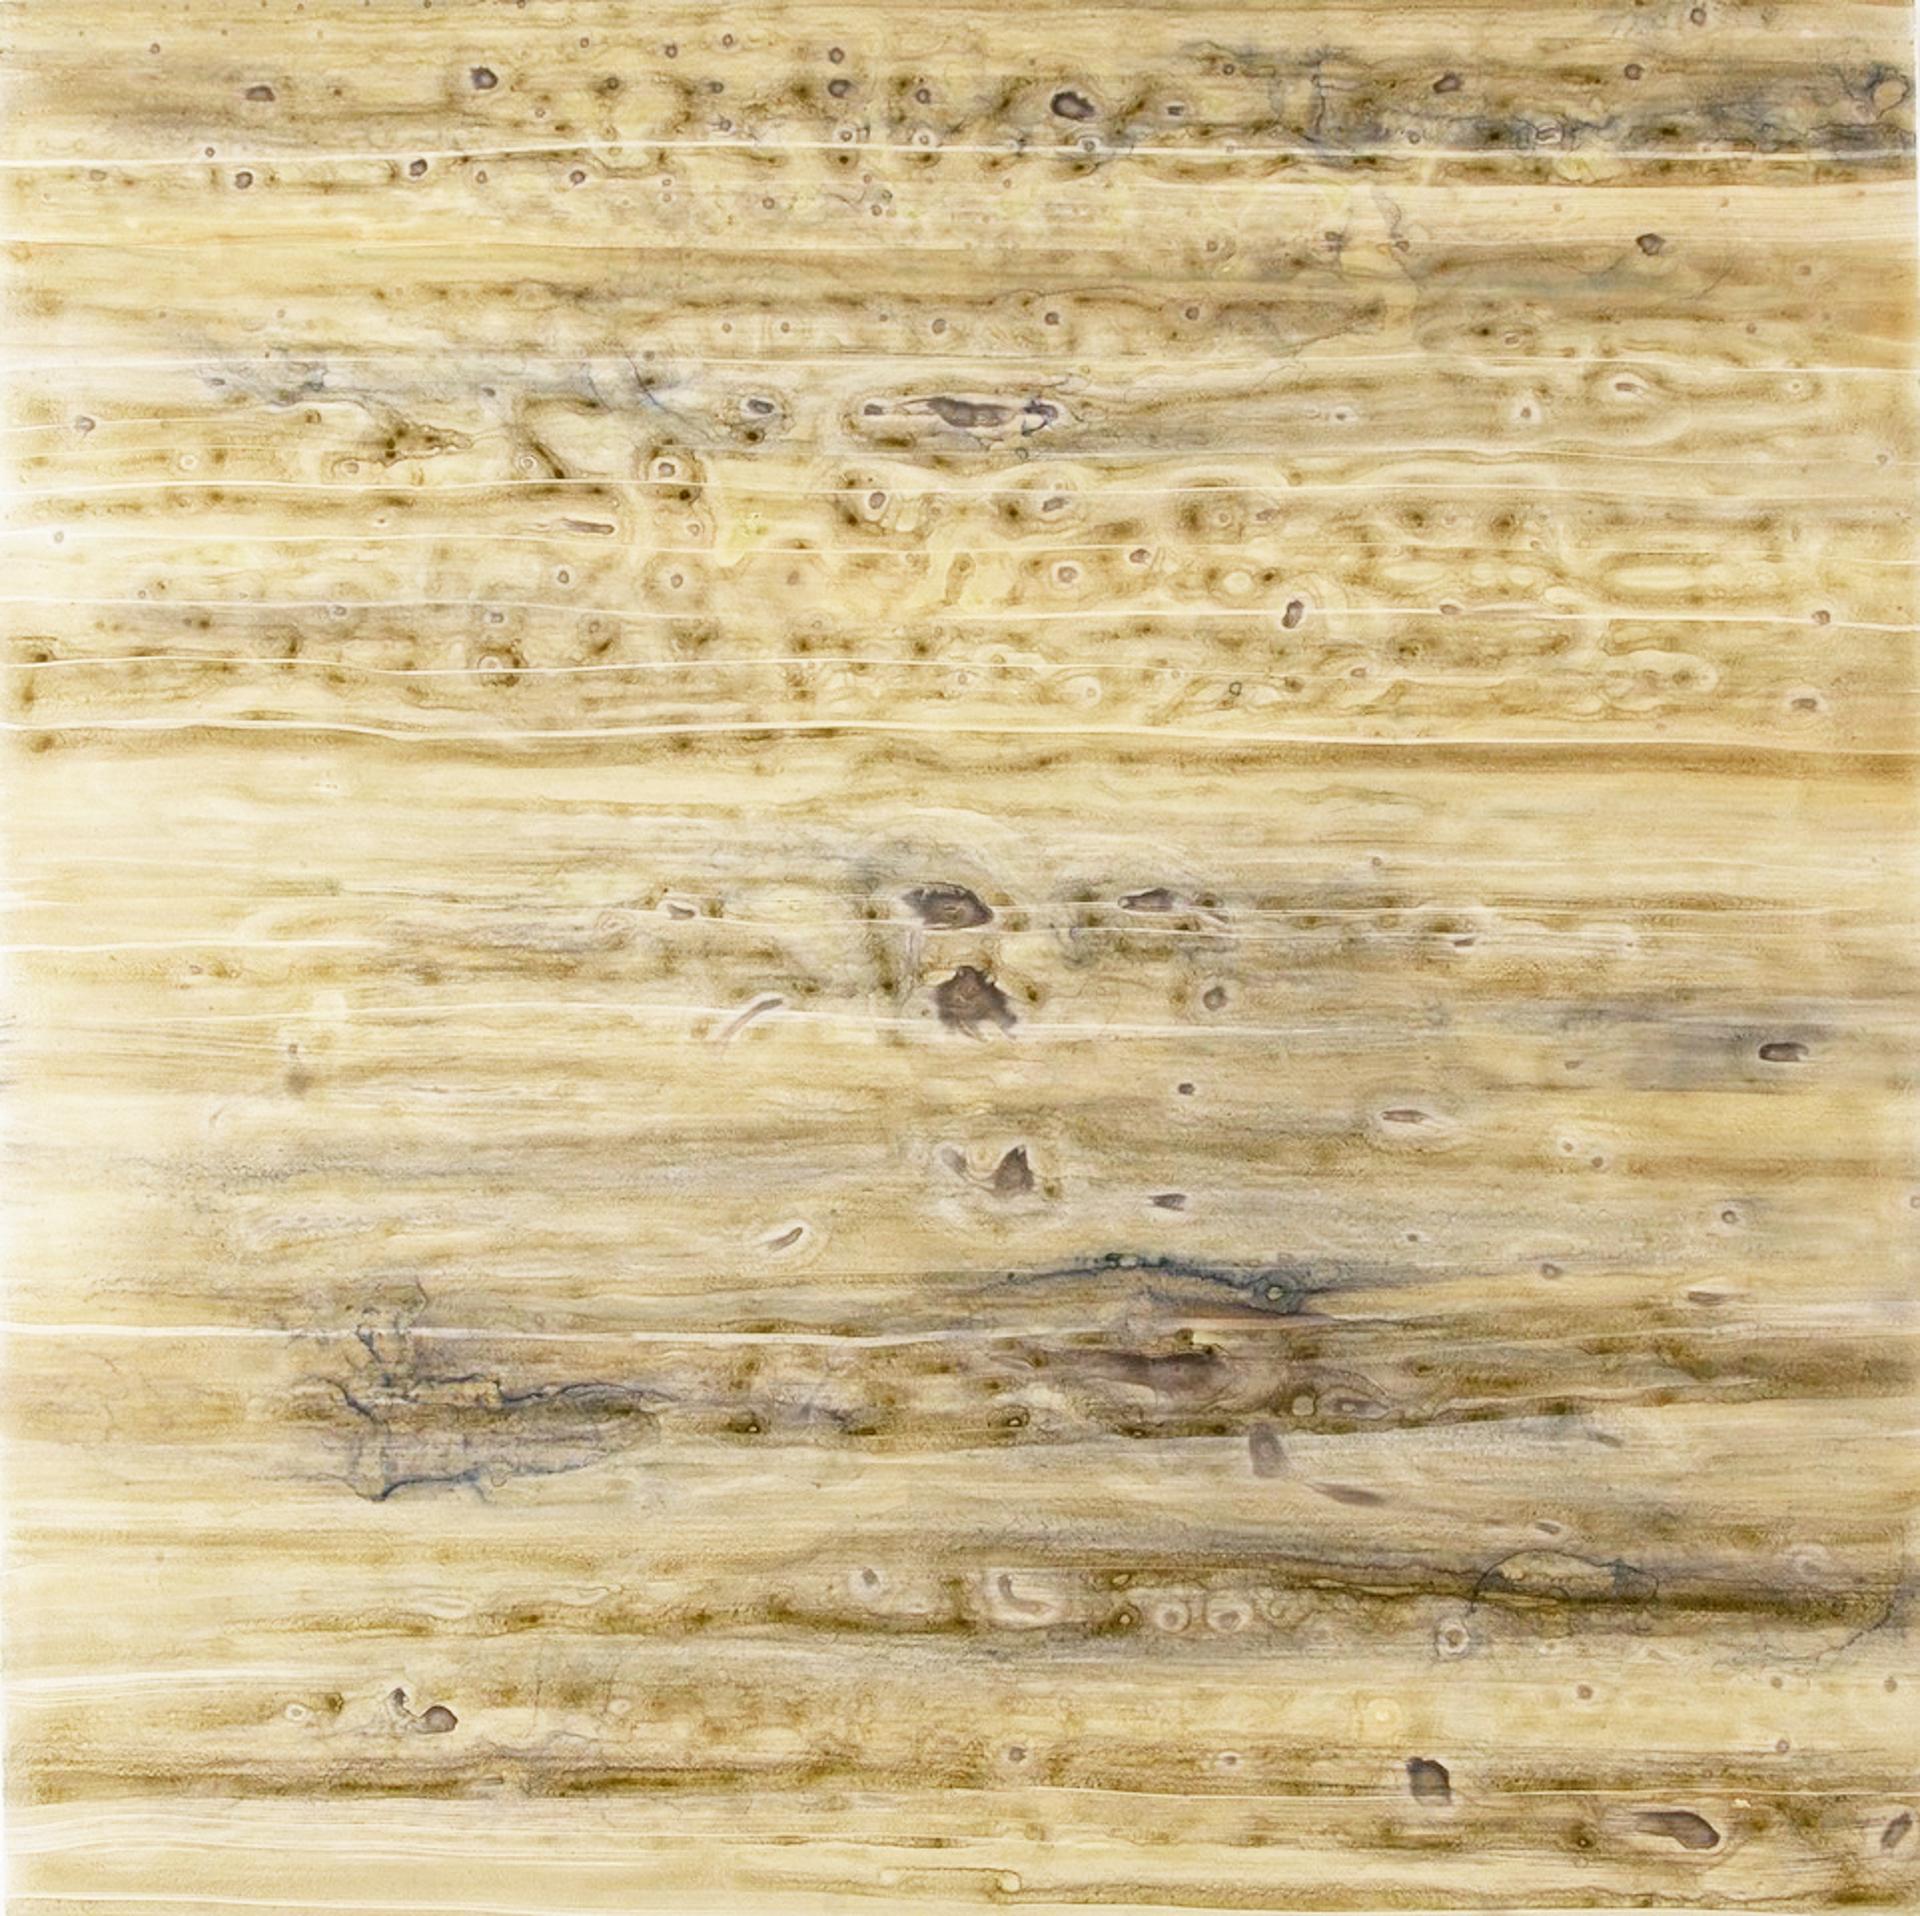 Silver Lining no. 1411 by Jessie Morgan